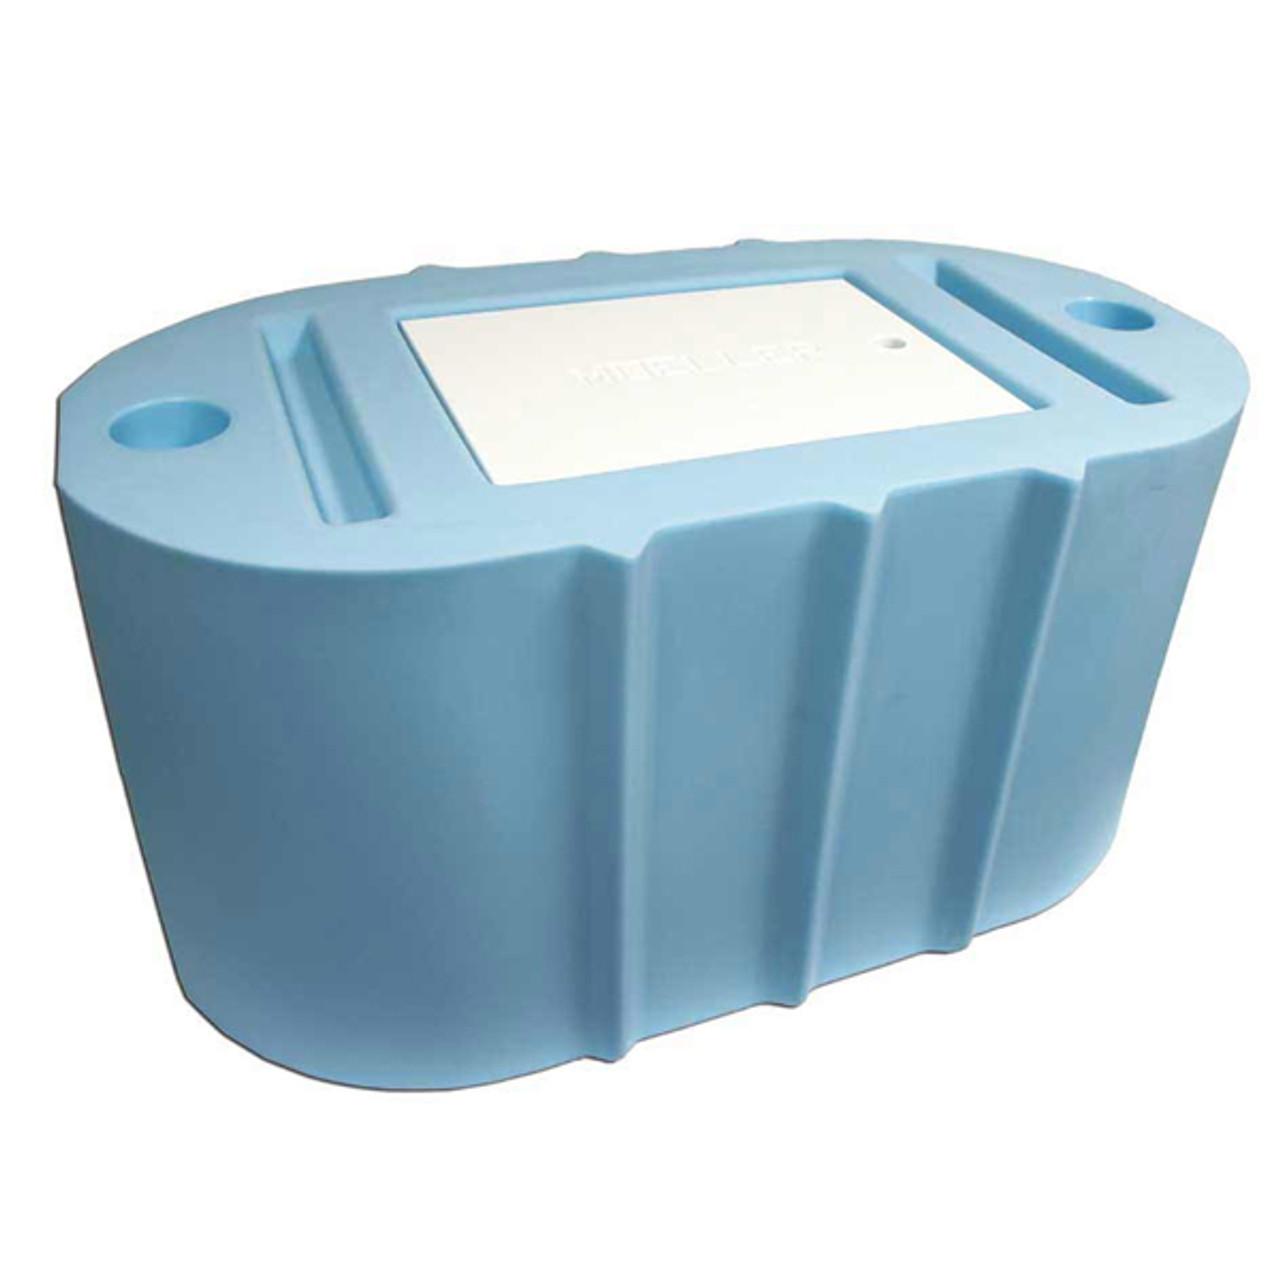 Moeller 40 Gallon Light Blue Oval Livewell